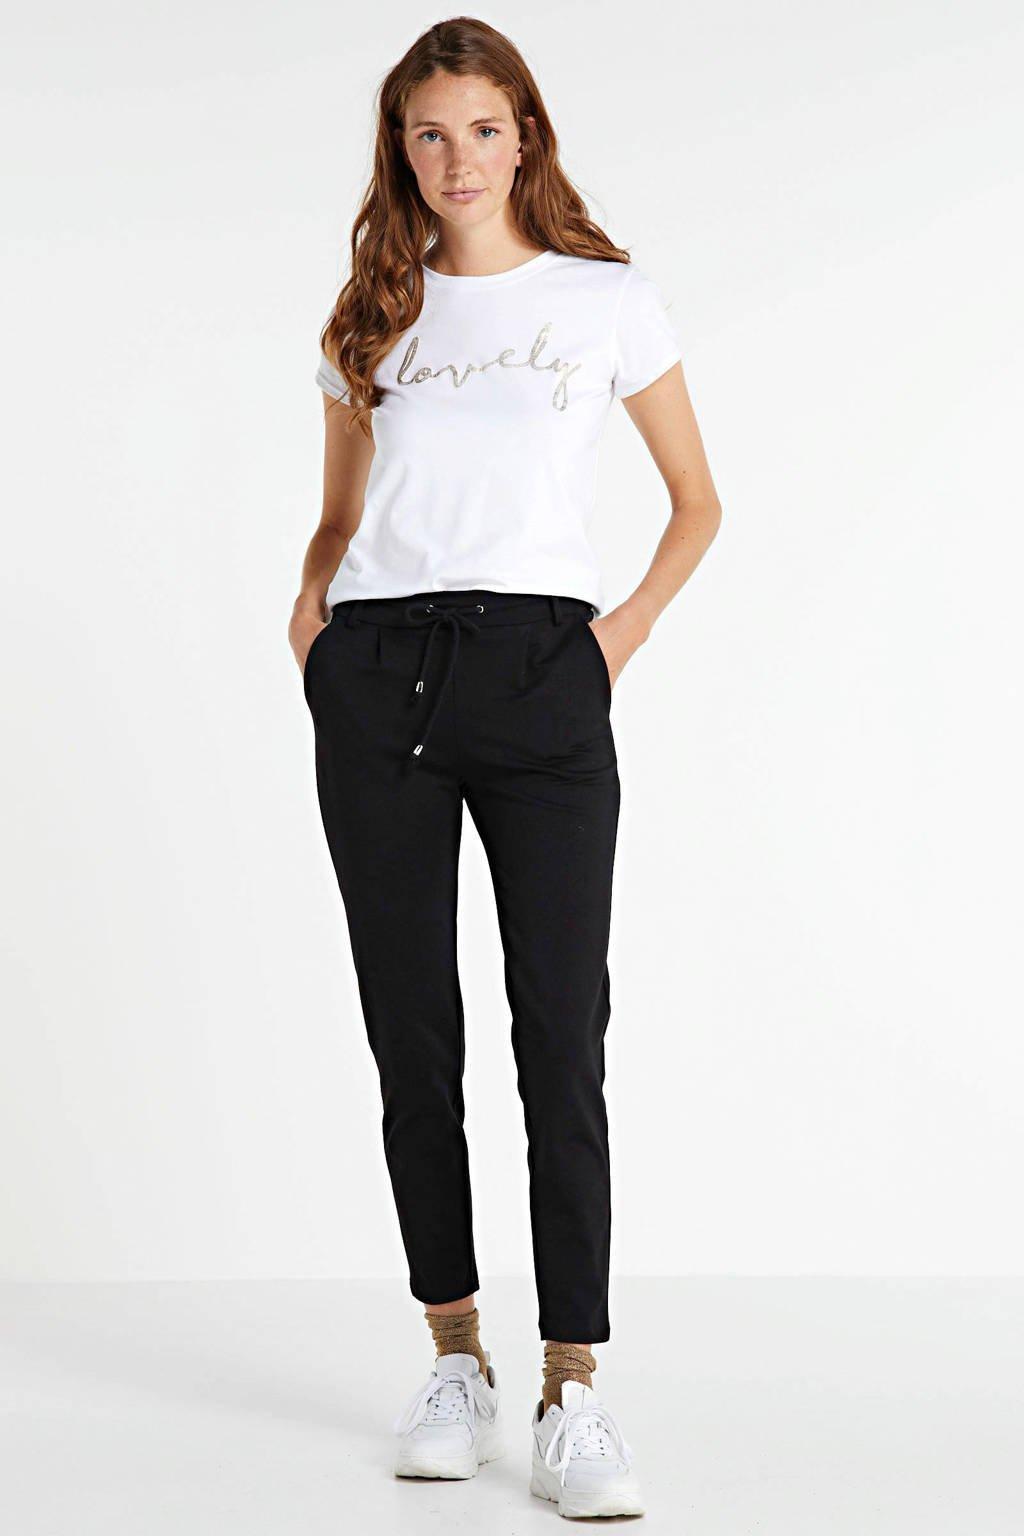 JOSS T-shirt met tekstprint wit, Wit - lovely